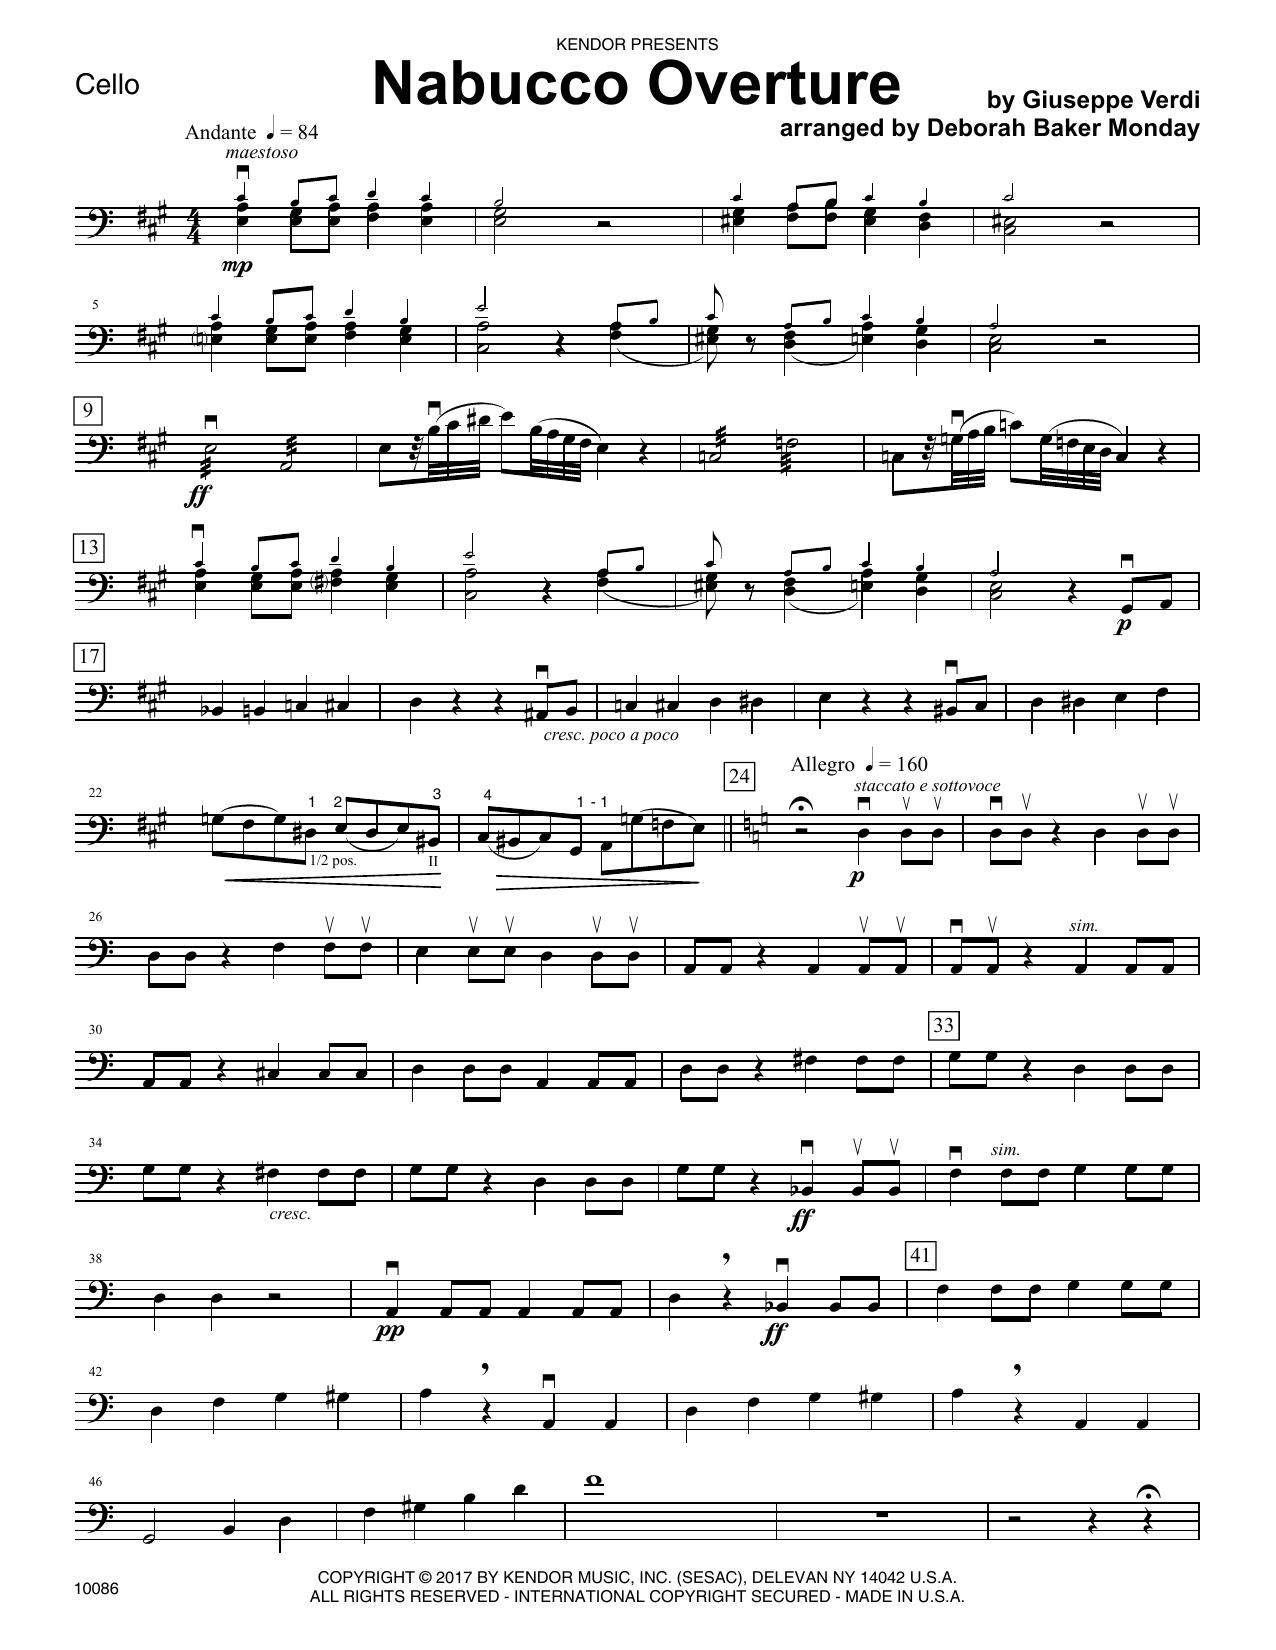 Nabucco Overture - Cello